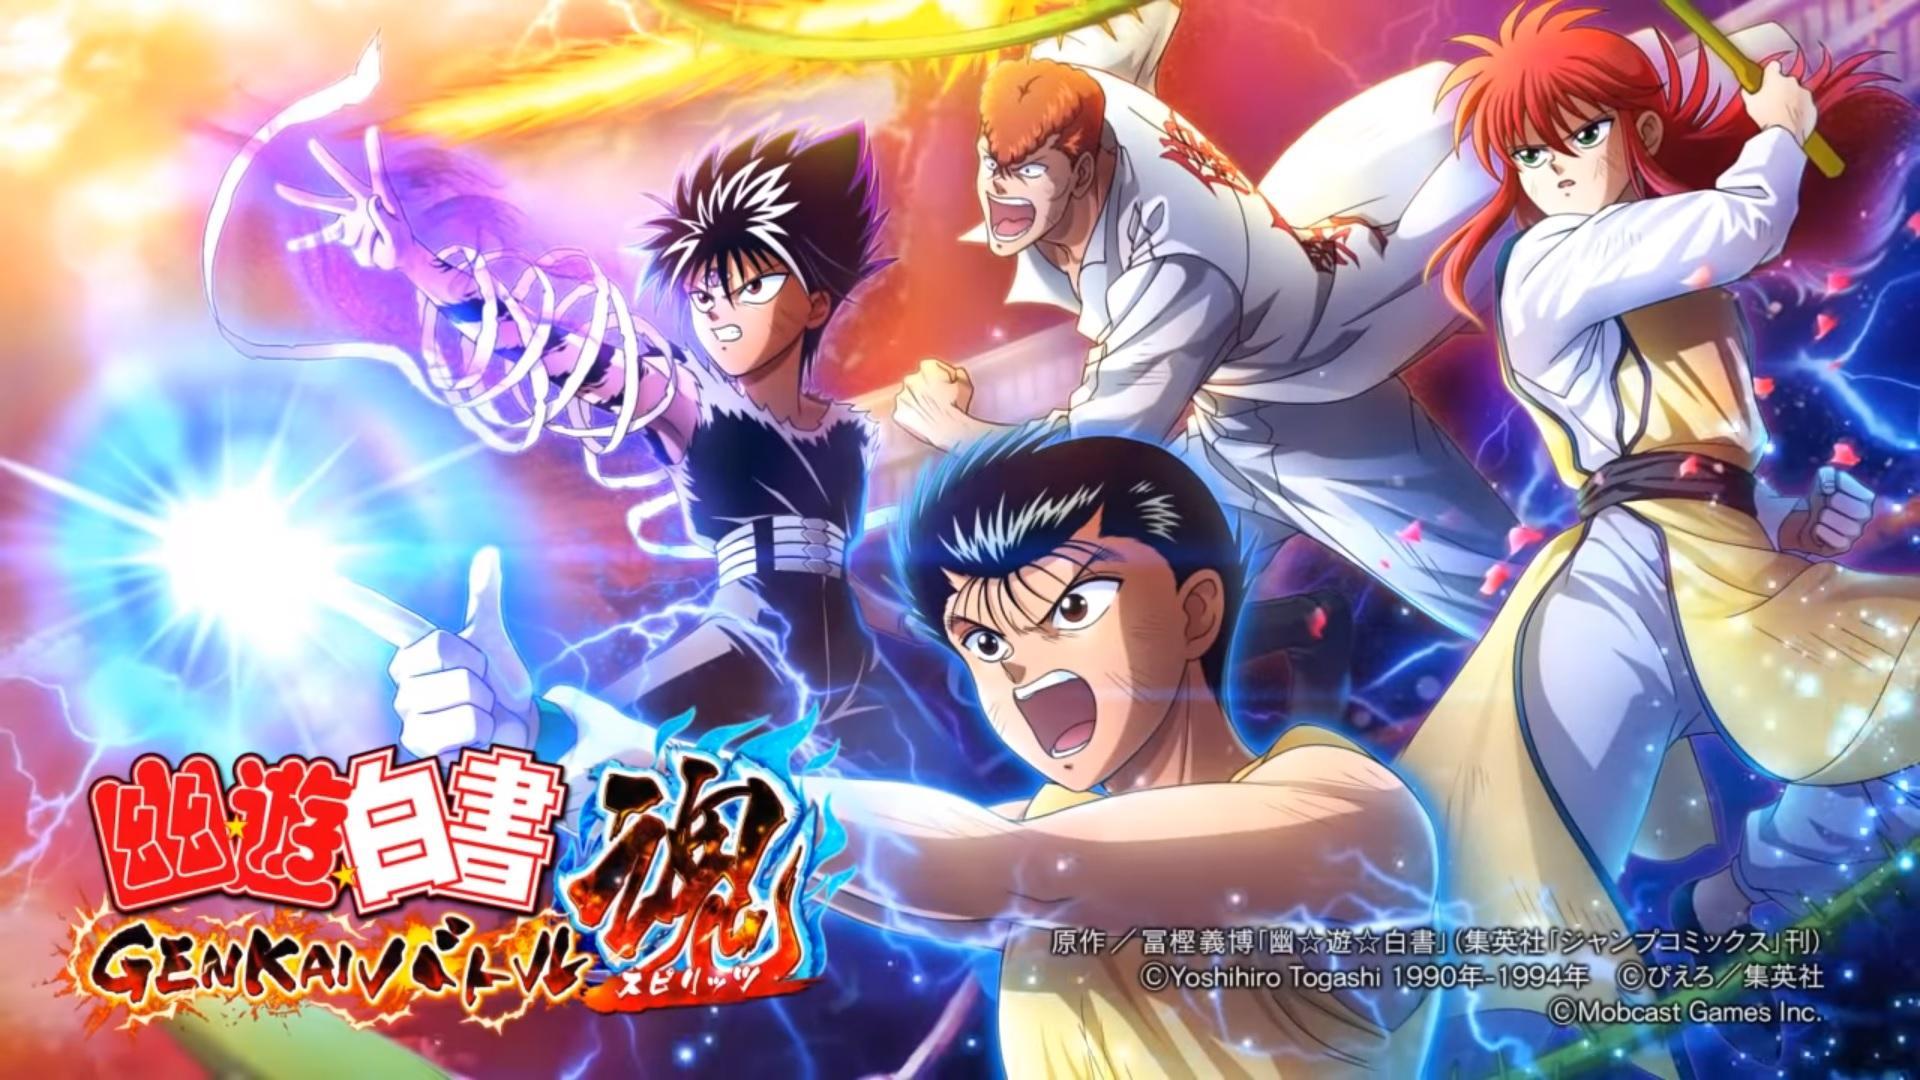 Download Yu Yu Hakusho Wallpaper Hd Backgrounds Download Itl Cat